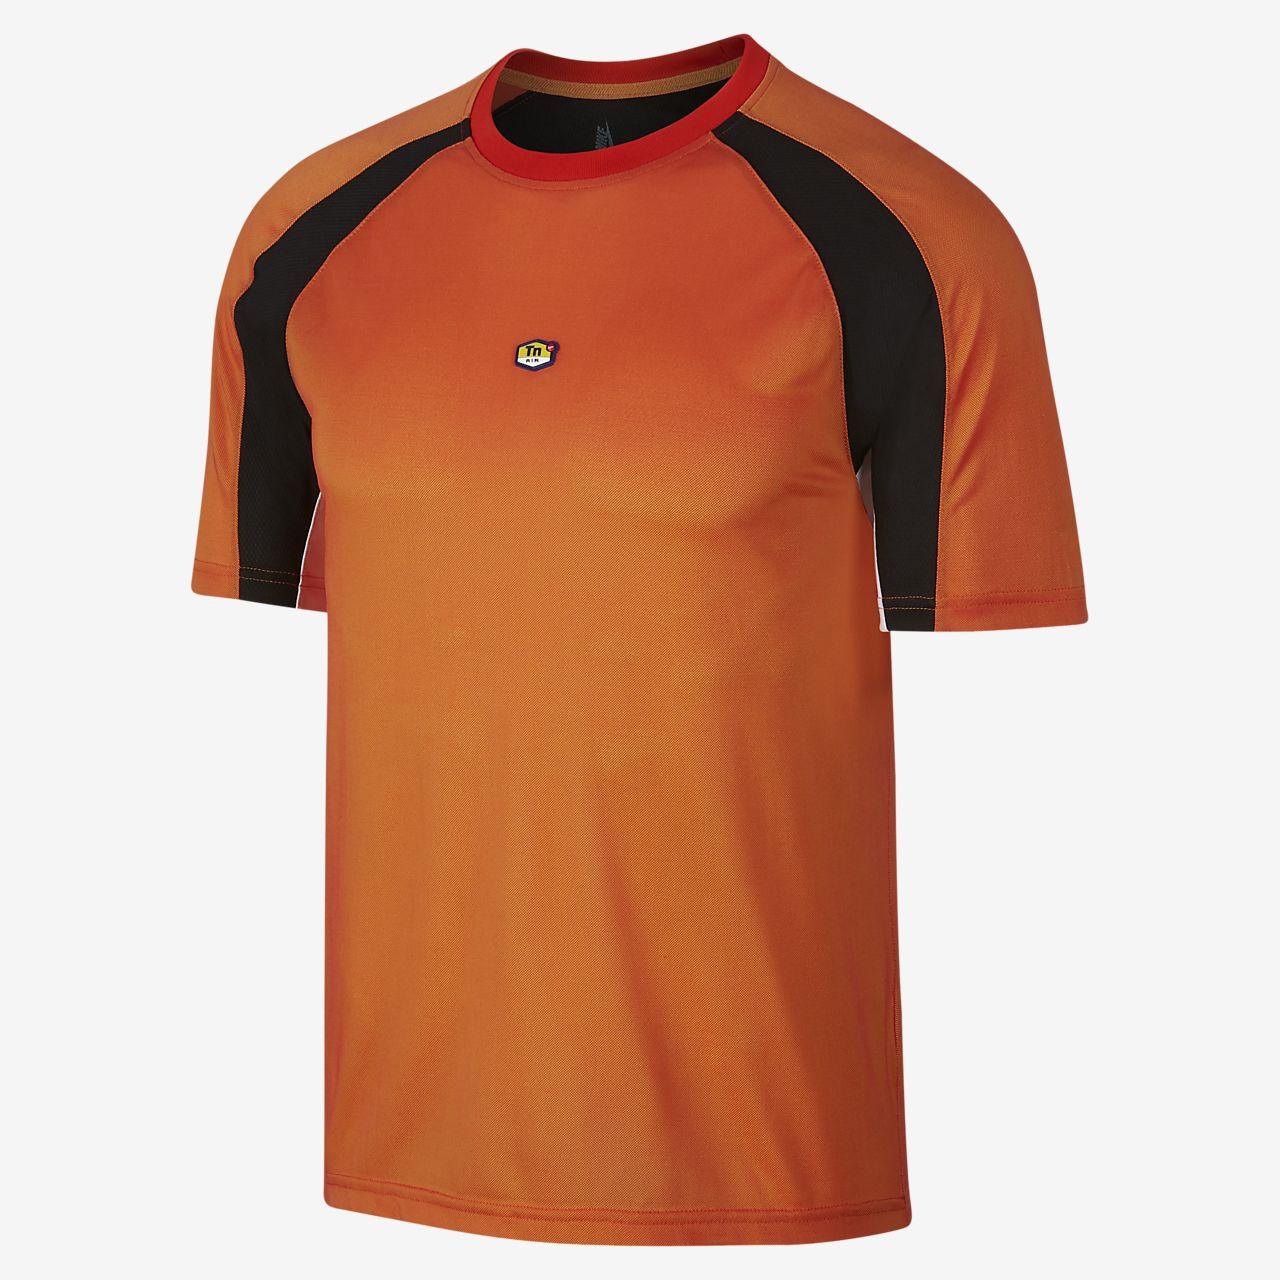 NikeLab Collection Tn Camiseta de manga corta - Hombre